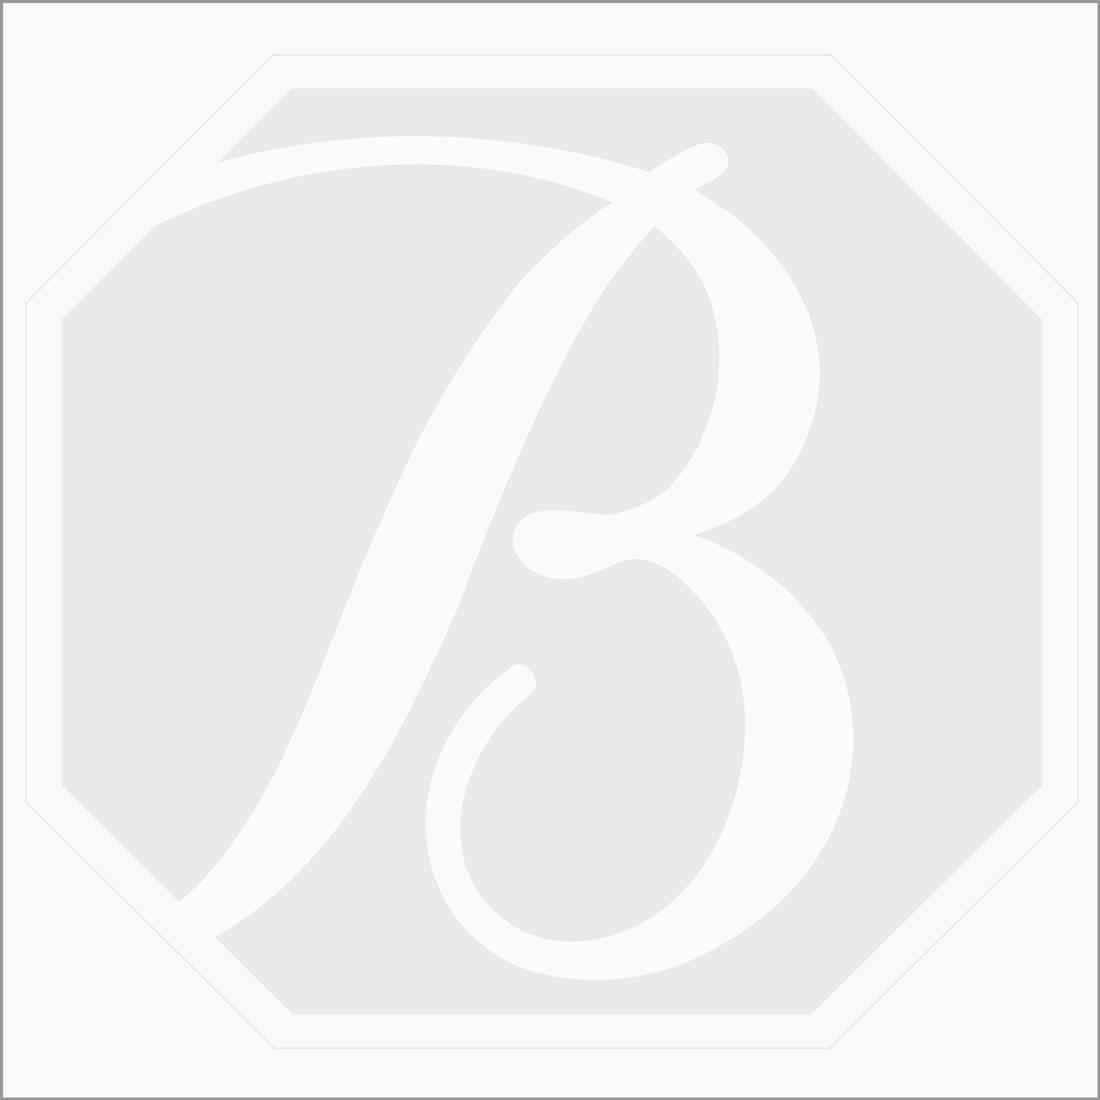 8 x 6 mm - Dark Maroon Rose Cut Diamond Oval Shape - 3.21 carats (FncyDiaRC1053)